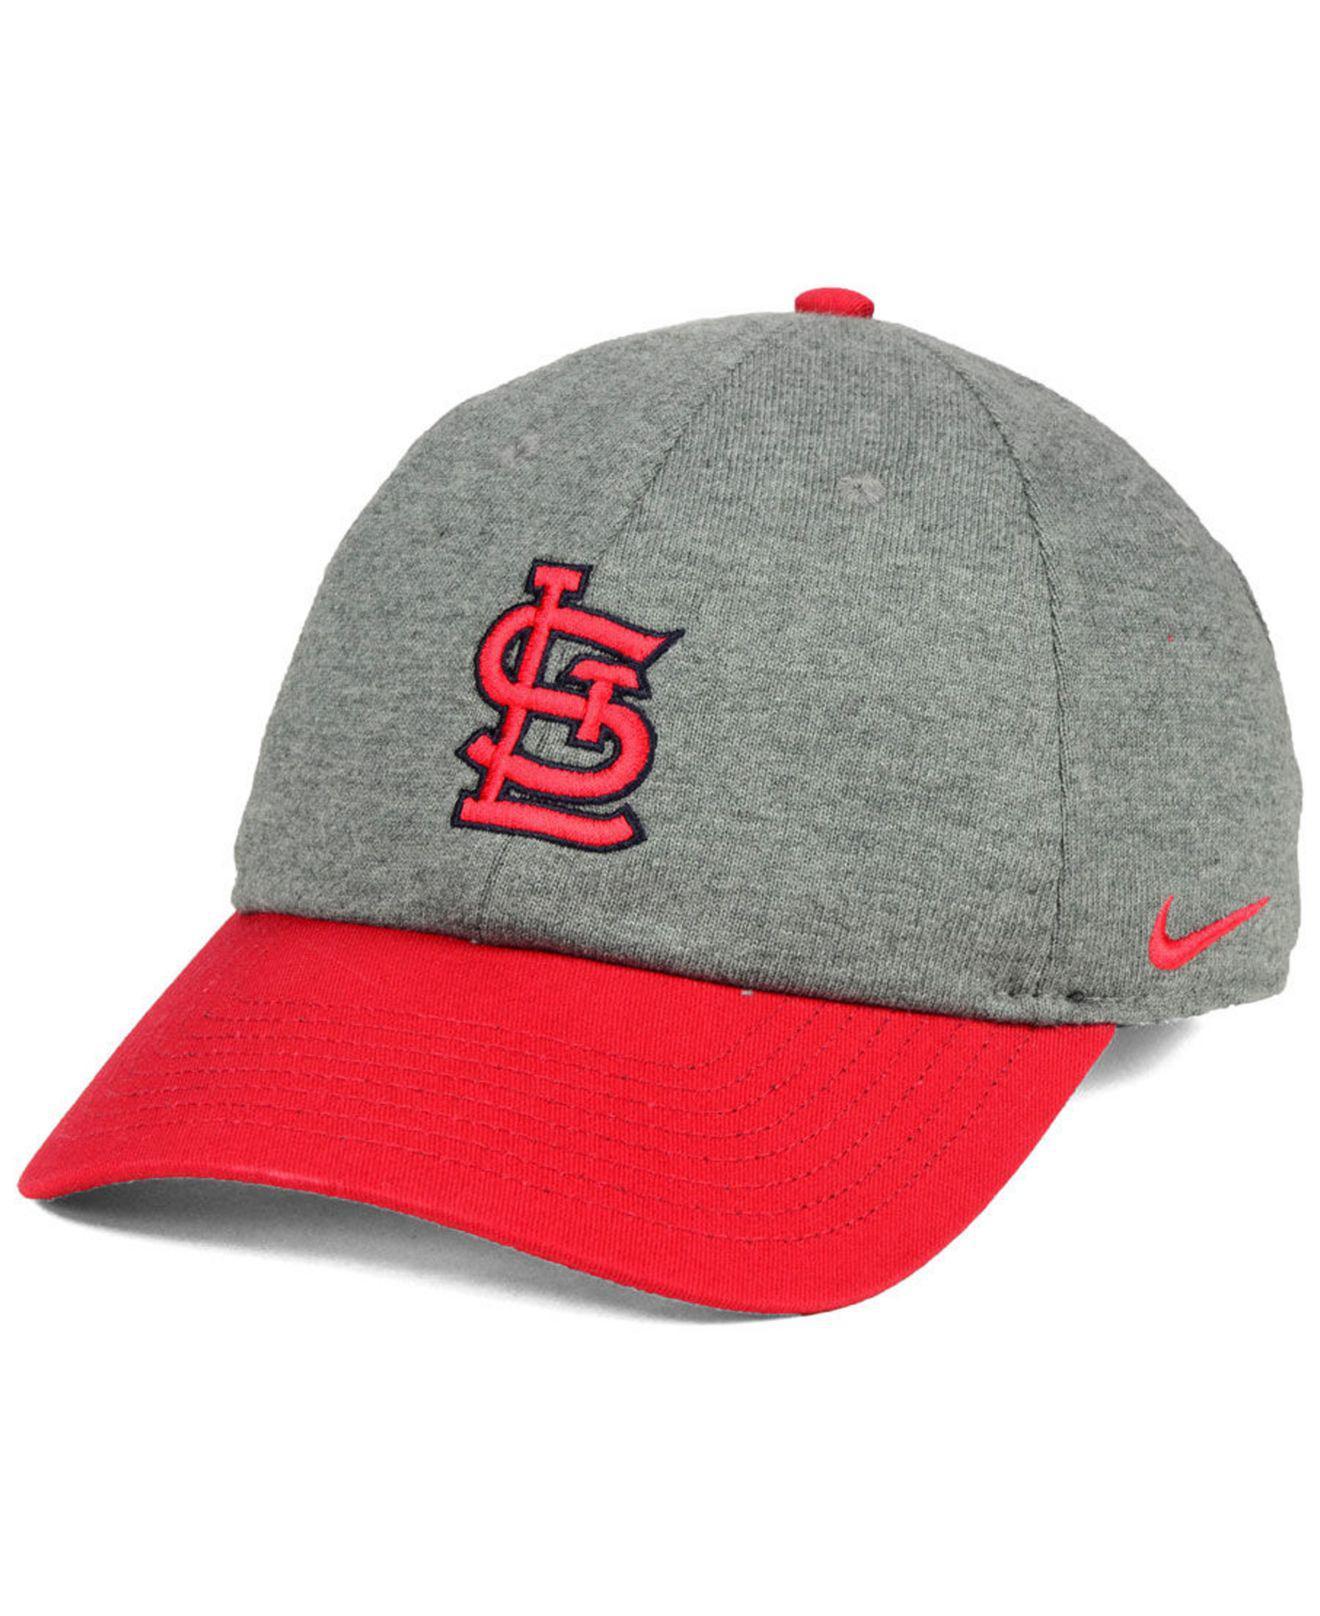 51533a470a5 Lyst - Nike St. Louis Cardinals 2 Tone Heather Cap for Men